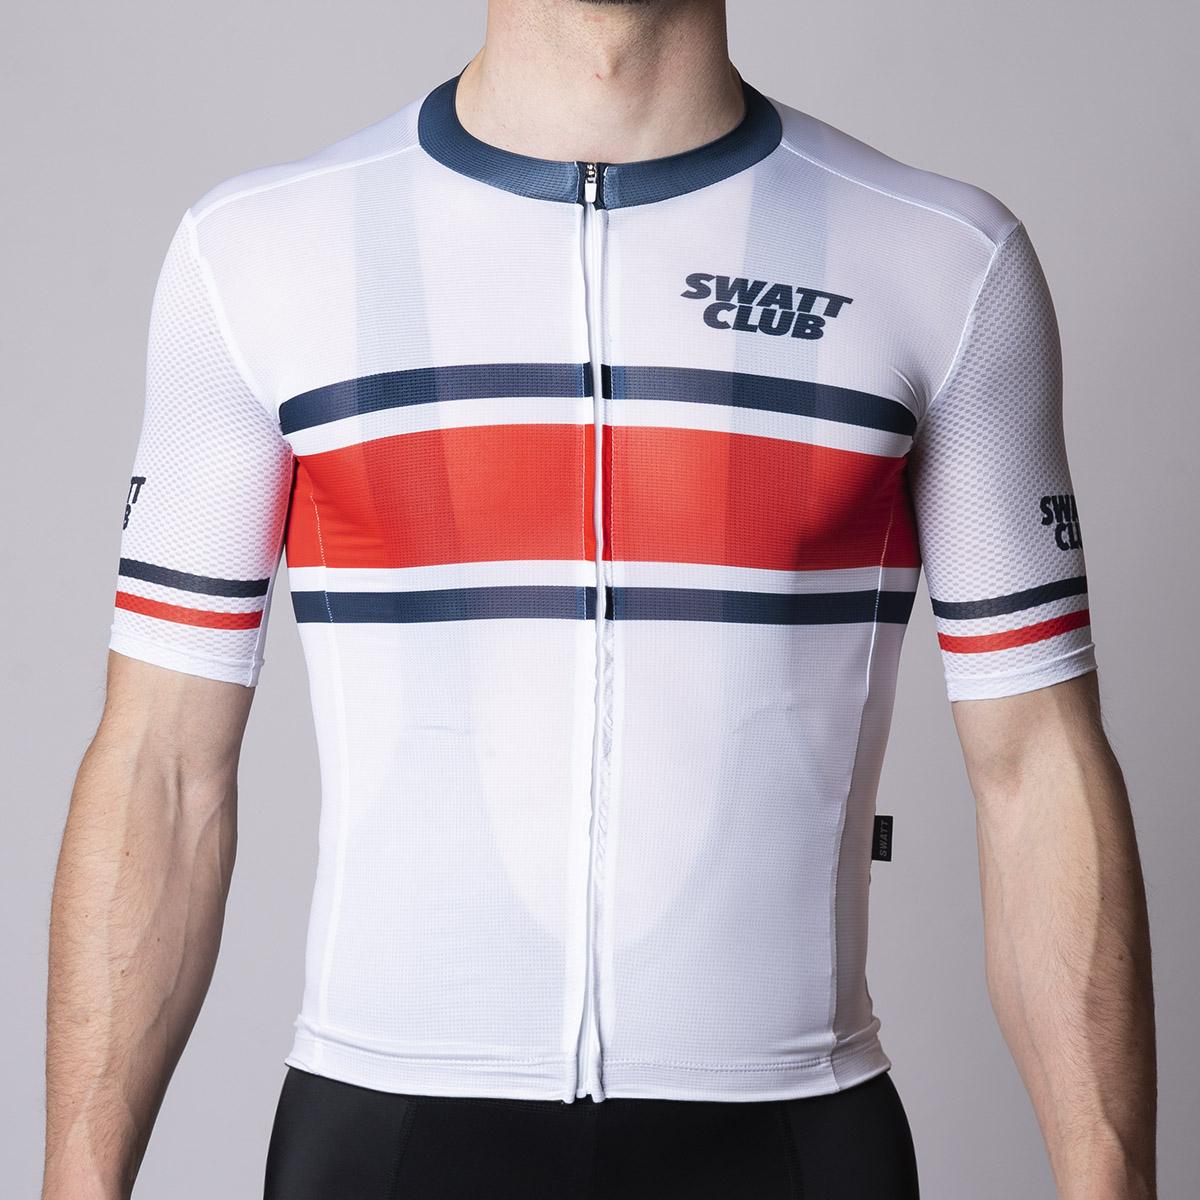 Paris swatt club cycling jersey